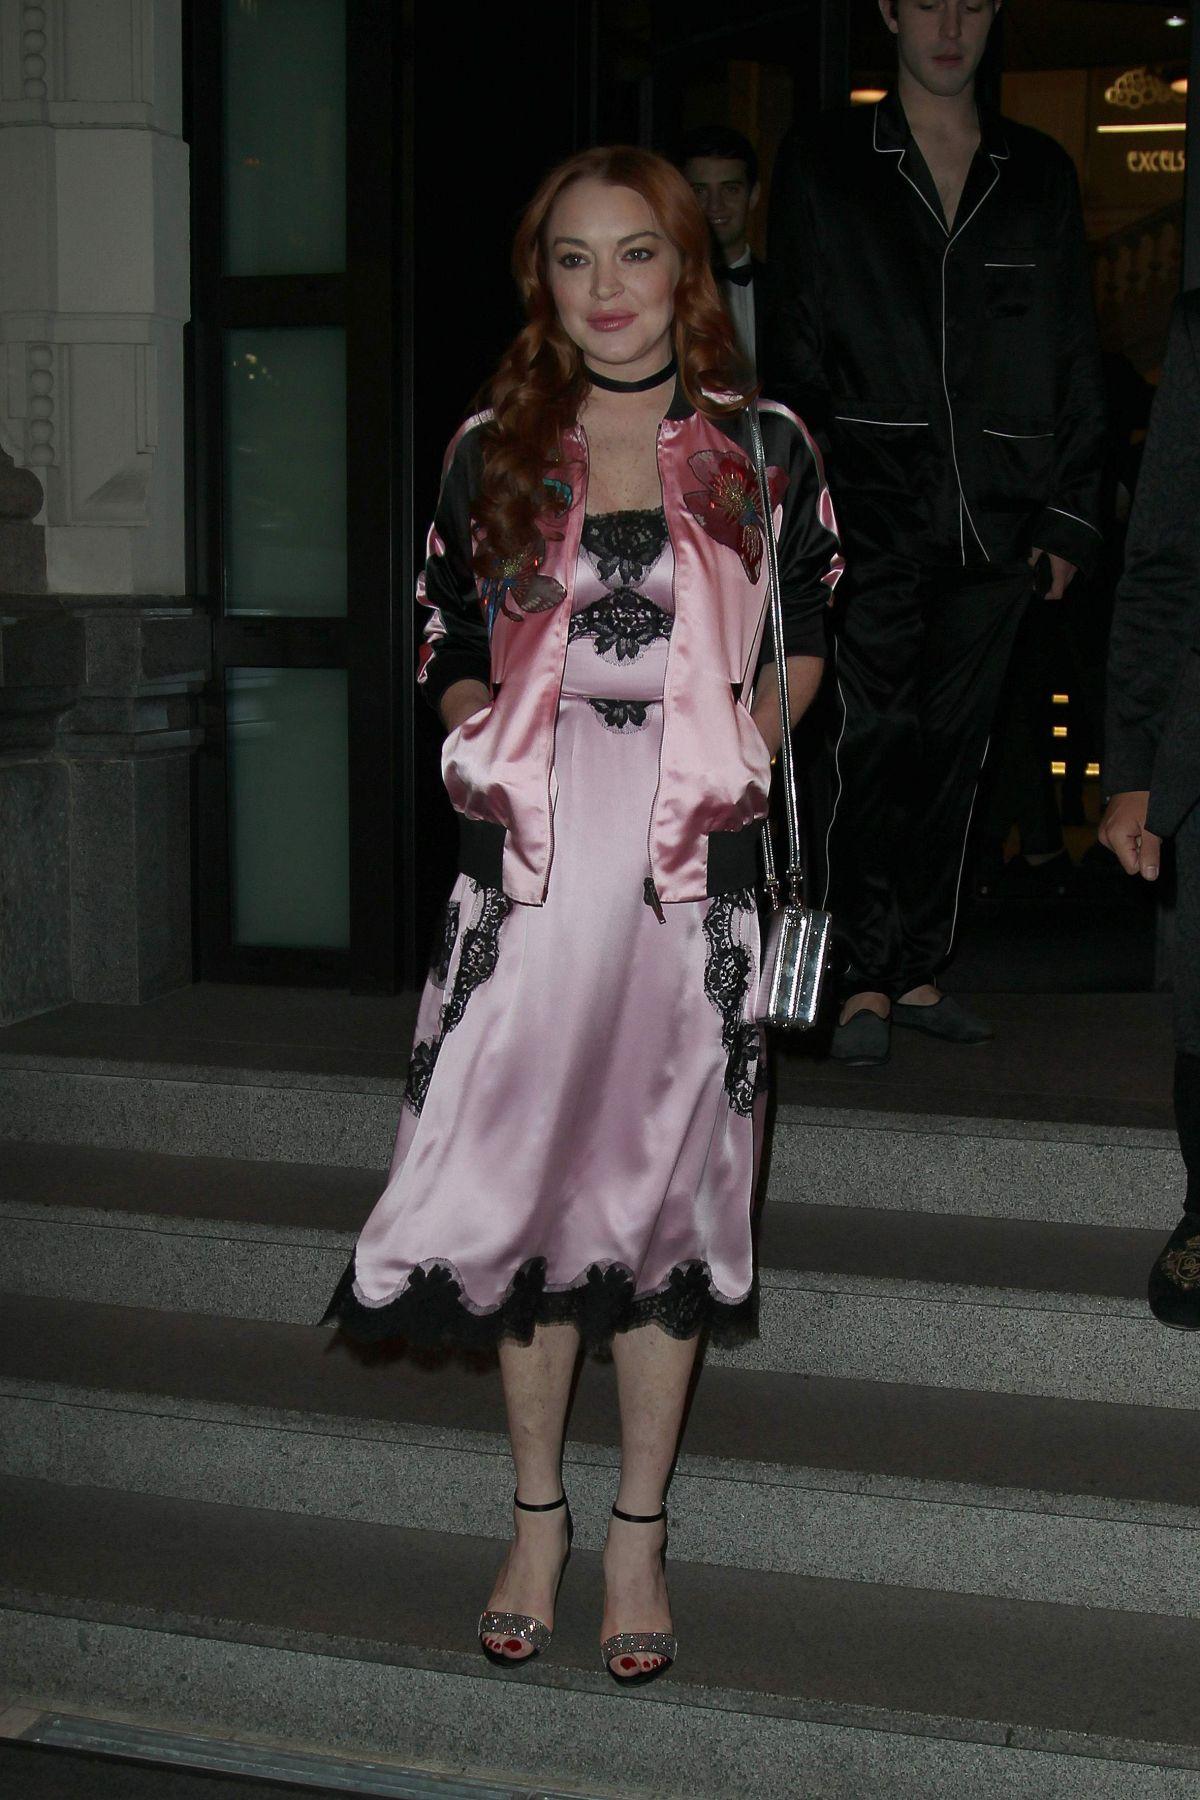 LINDSAY LOHAN Leaves Her Hotel in Milan 01/14/2017 ... Lindsay Lohan